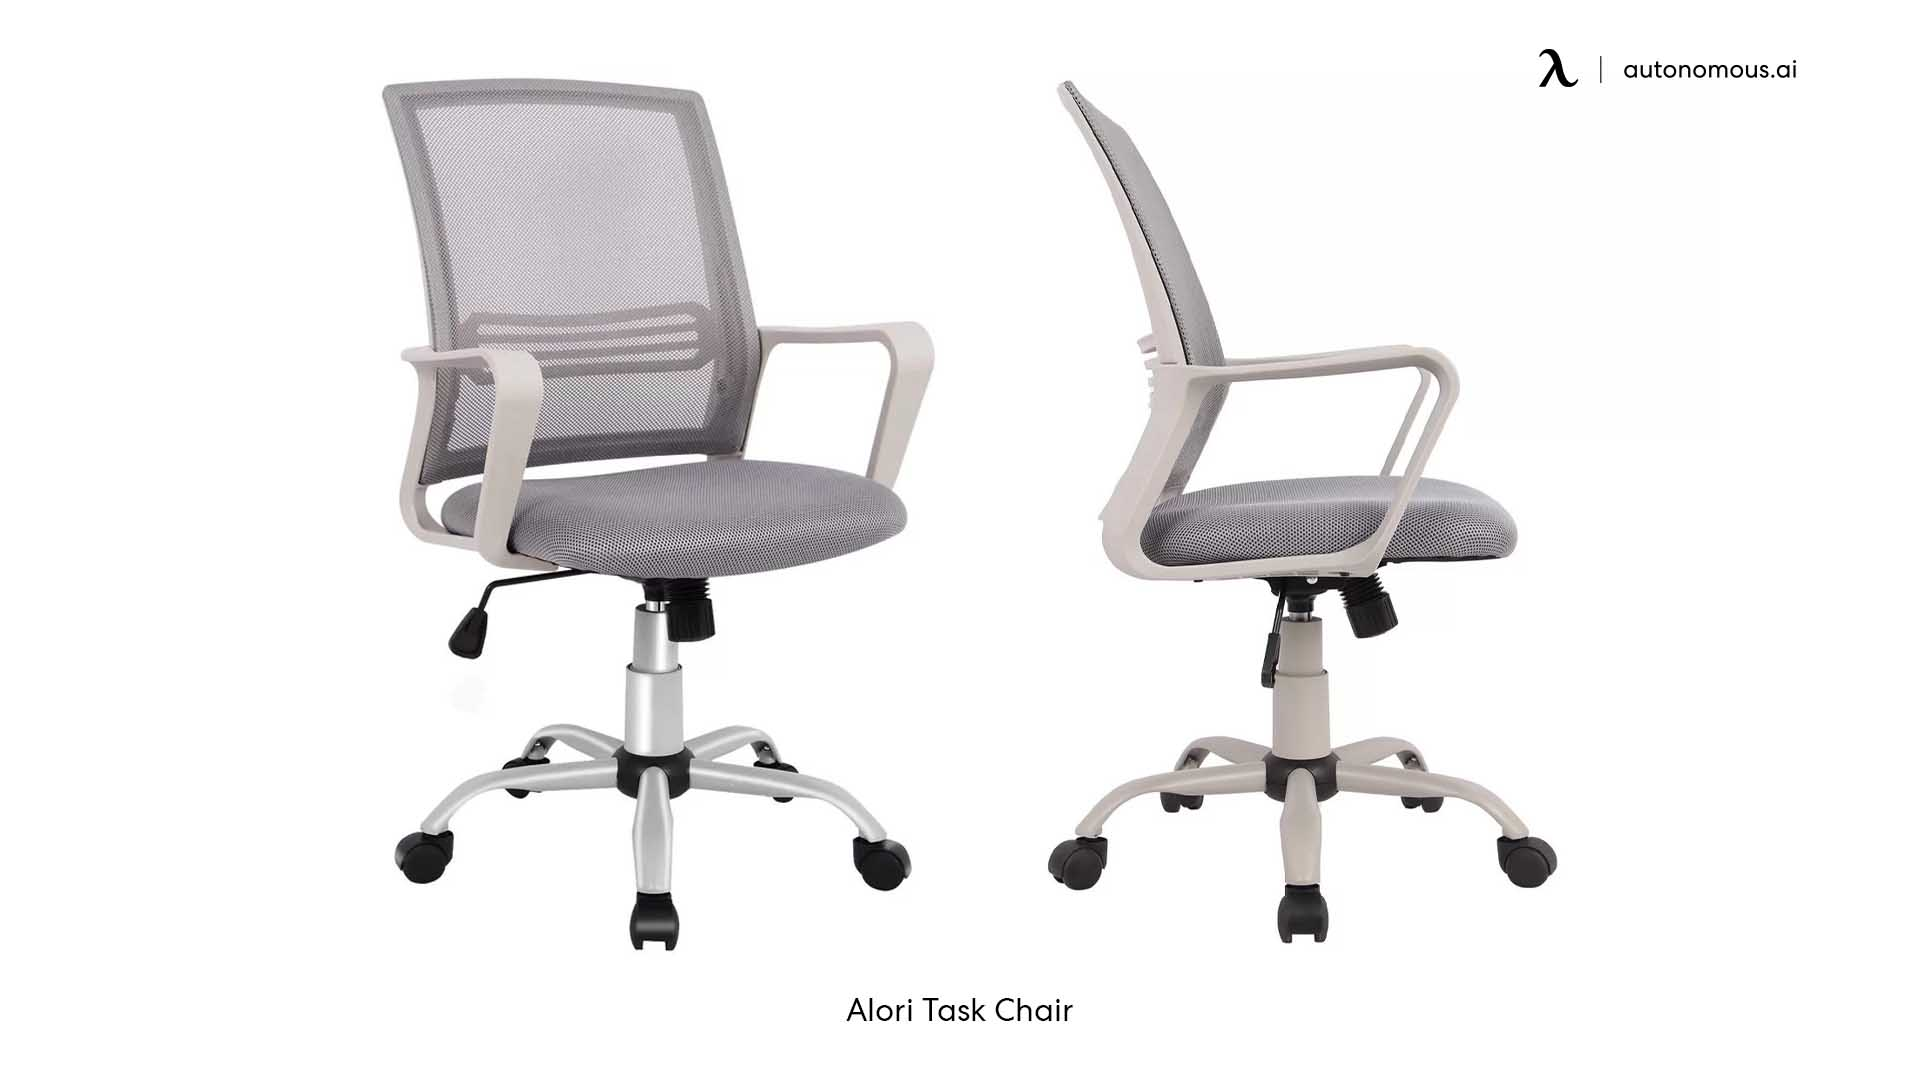 Alori Task Chair